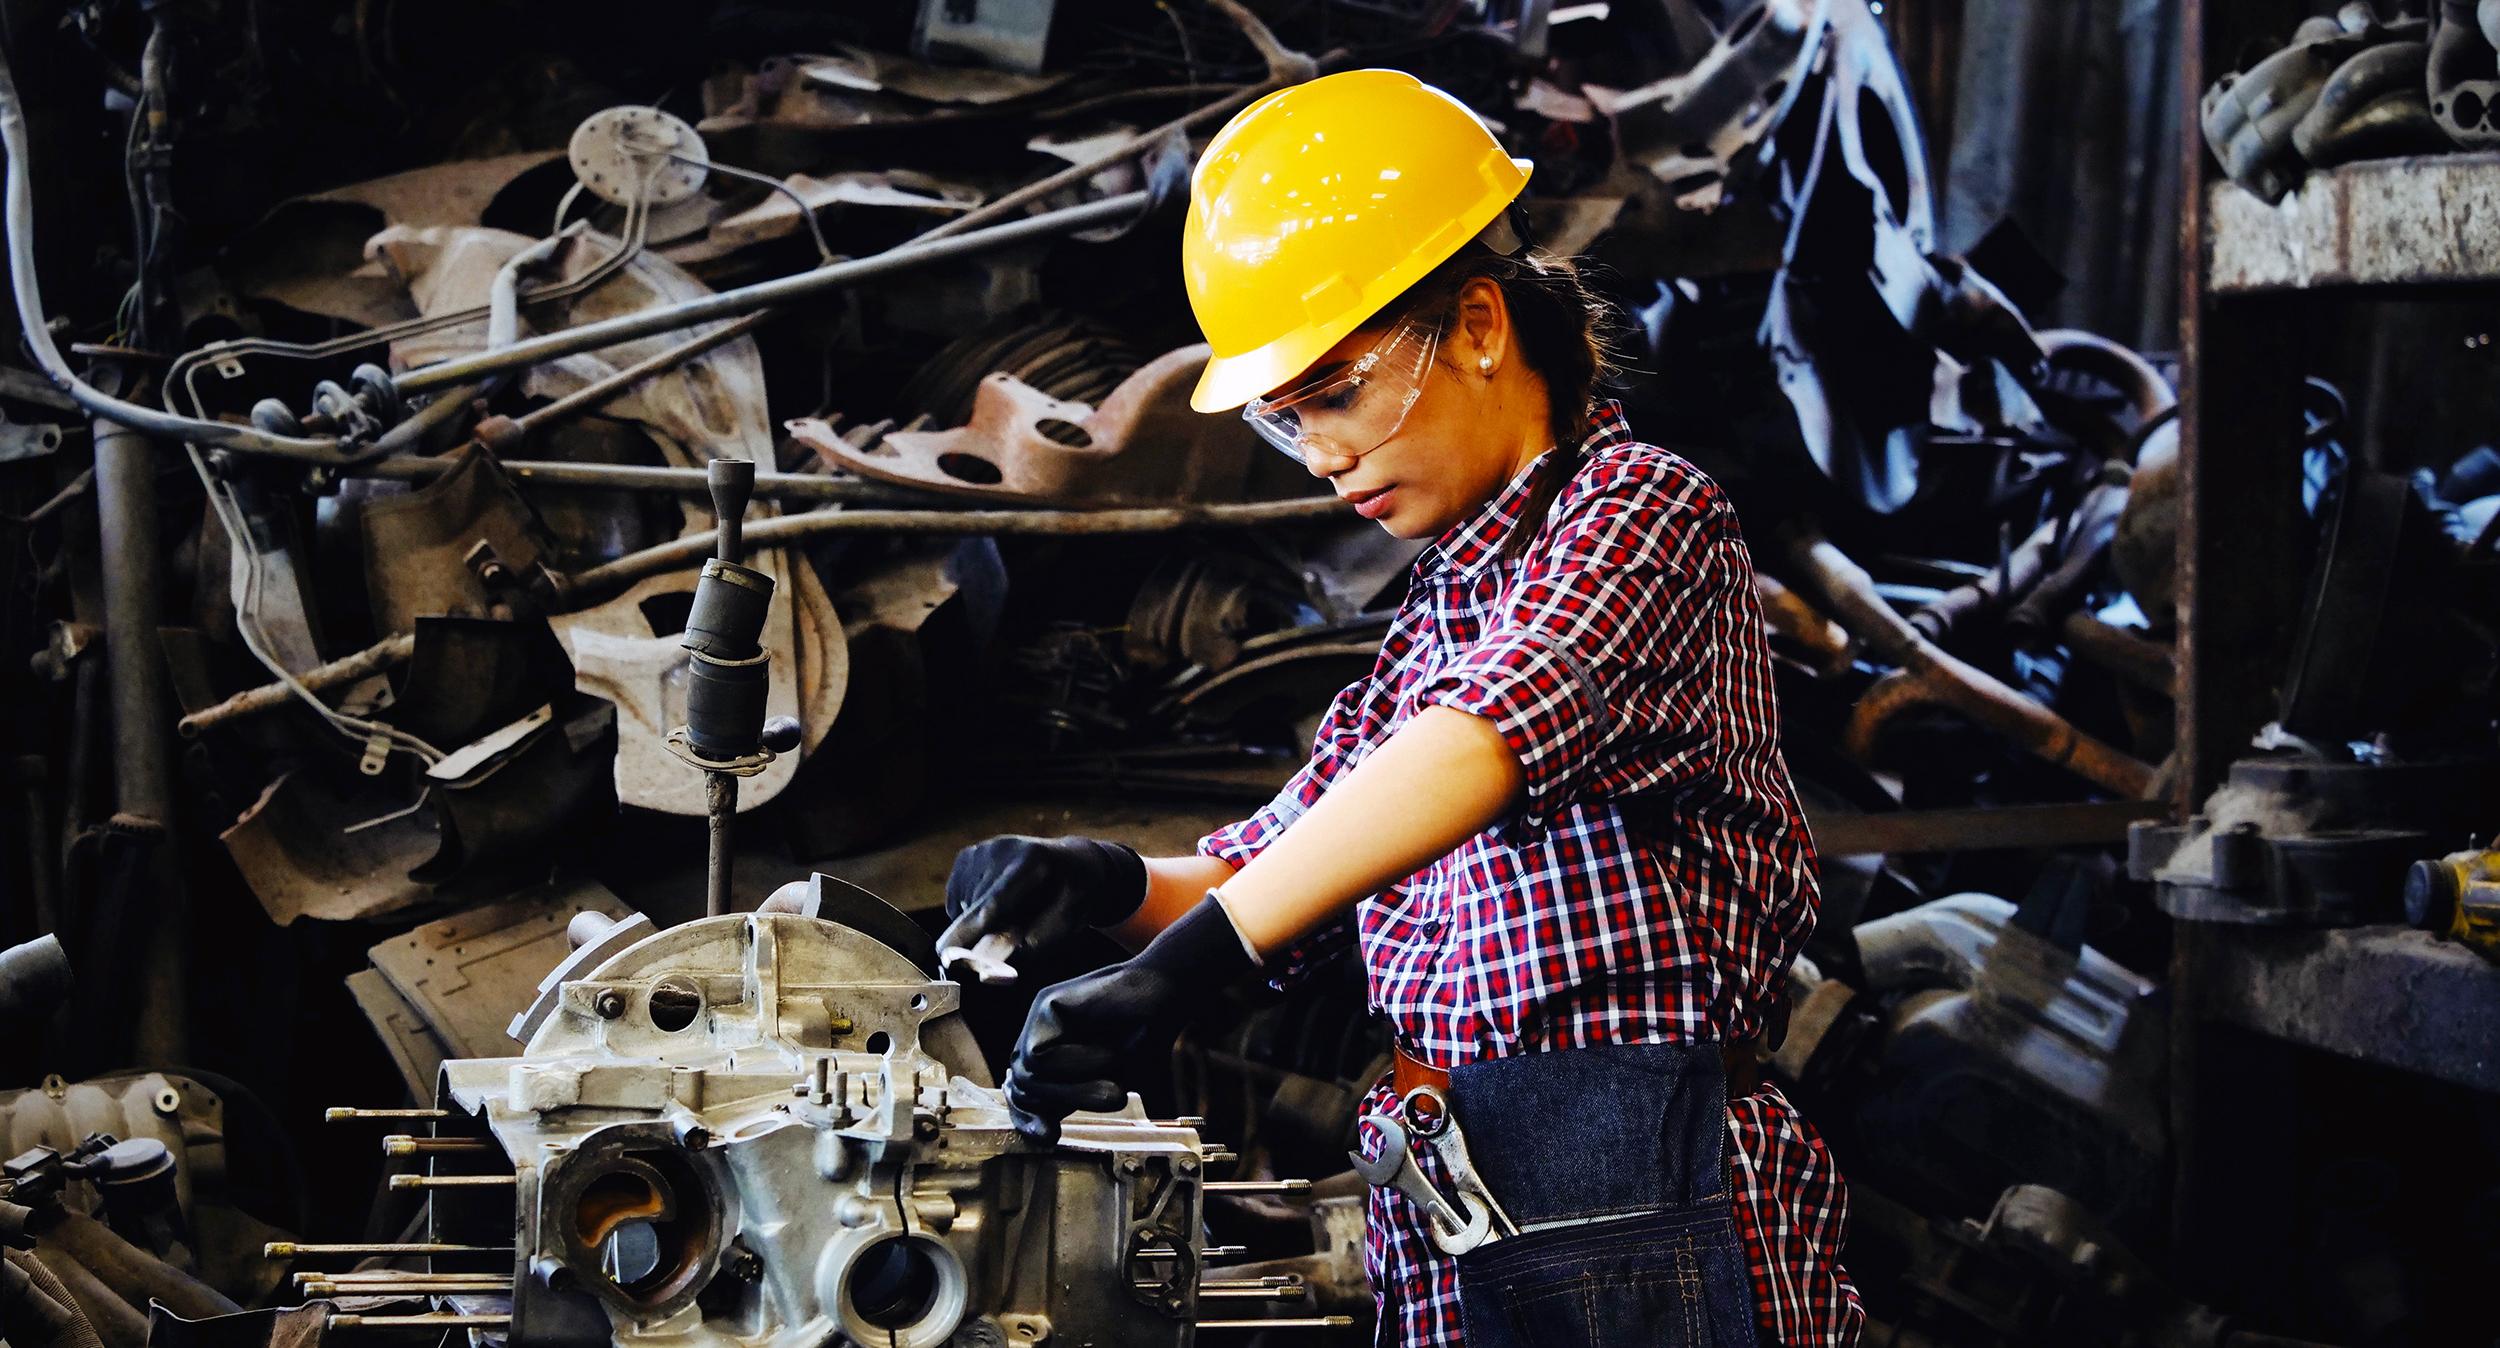 industrialMain.jpg